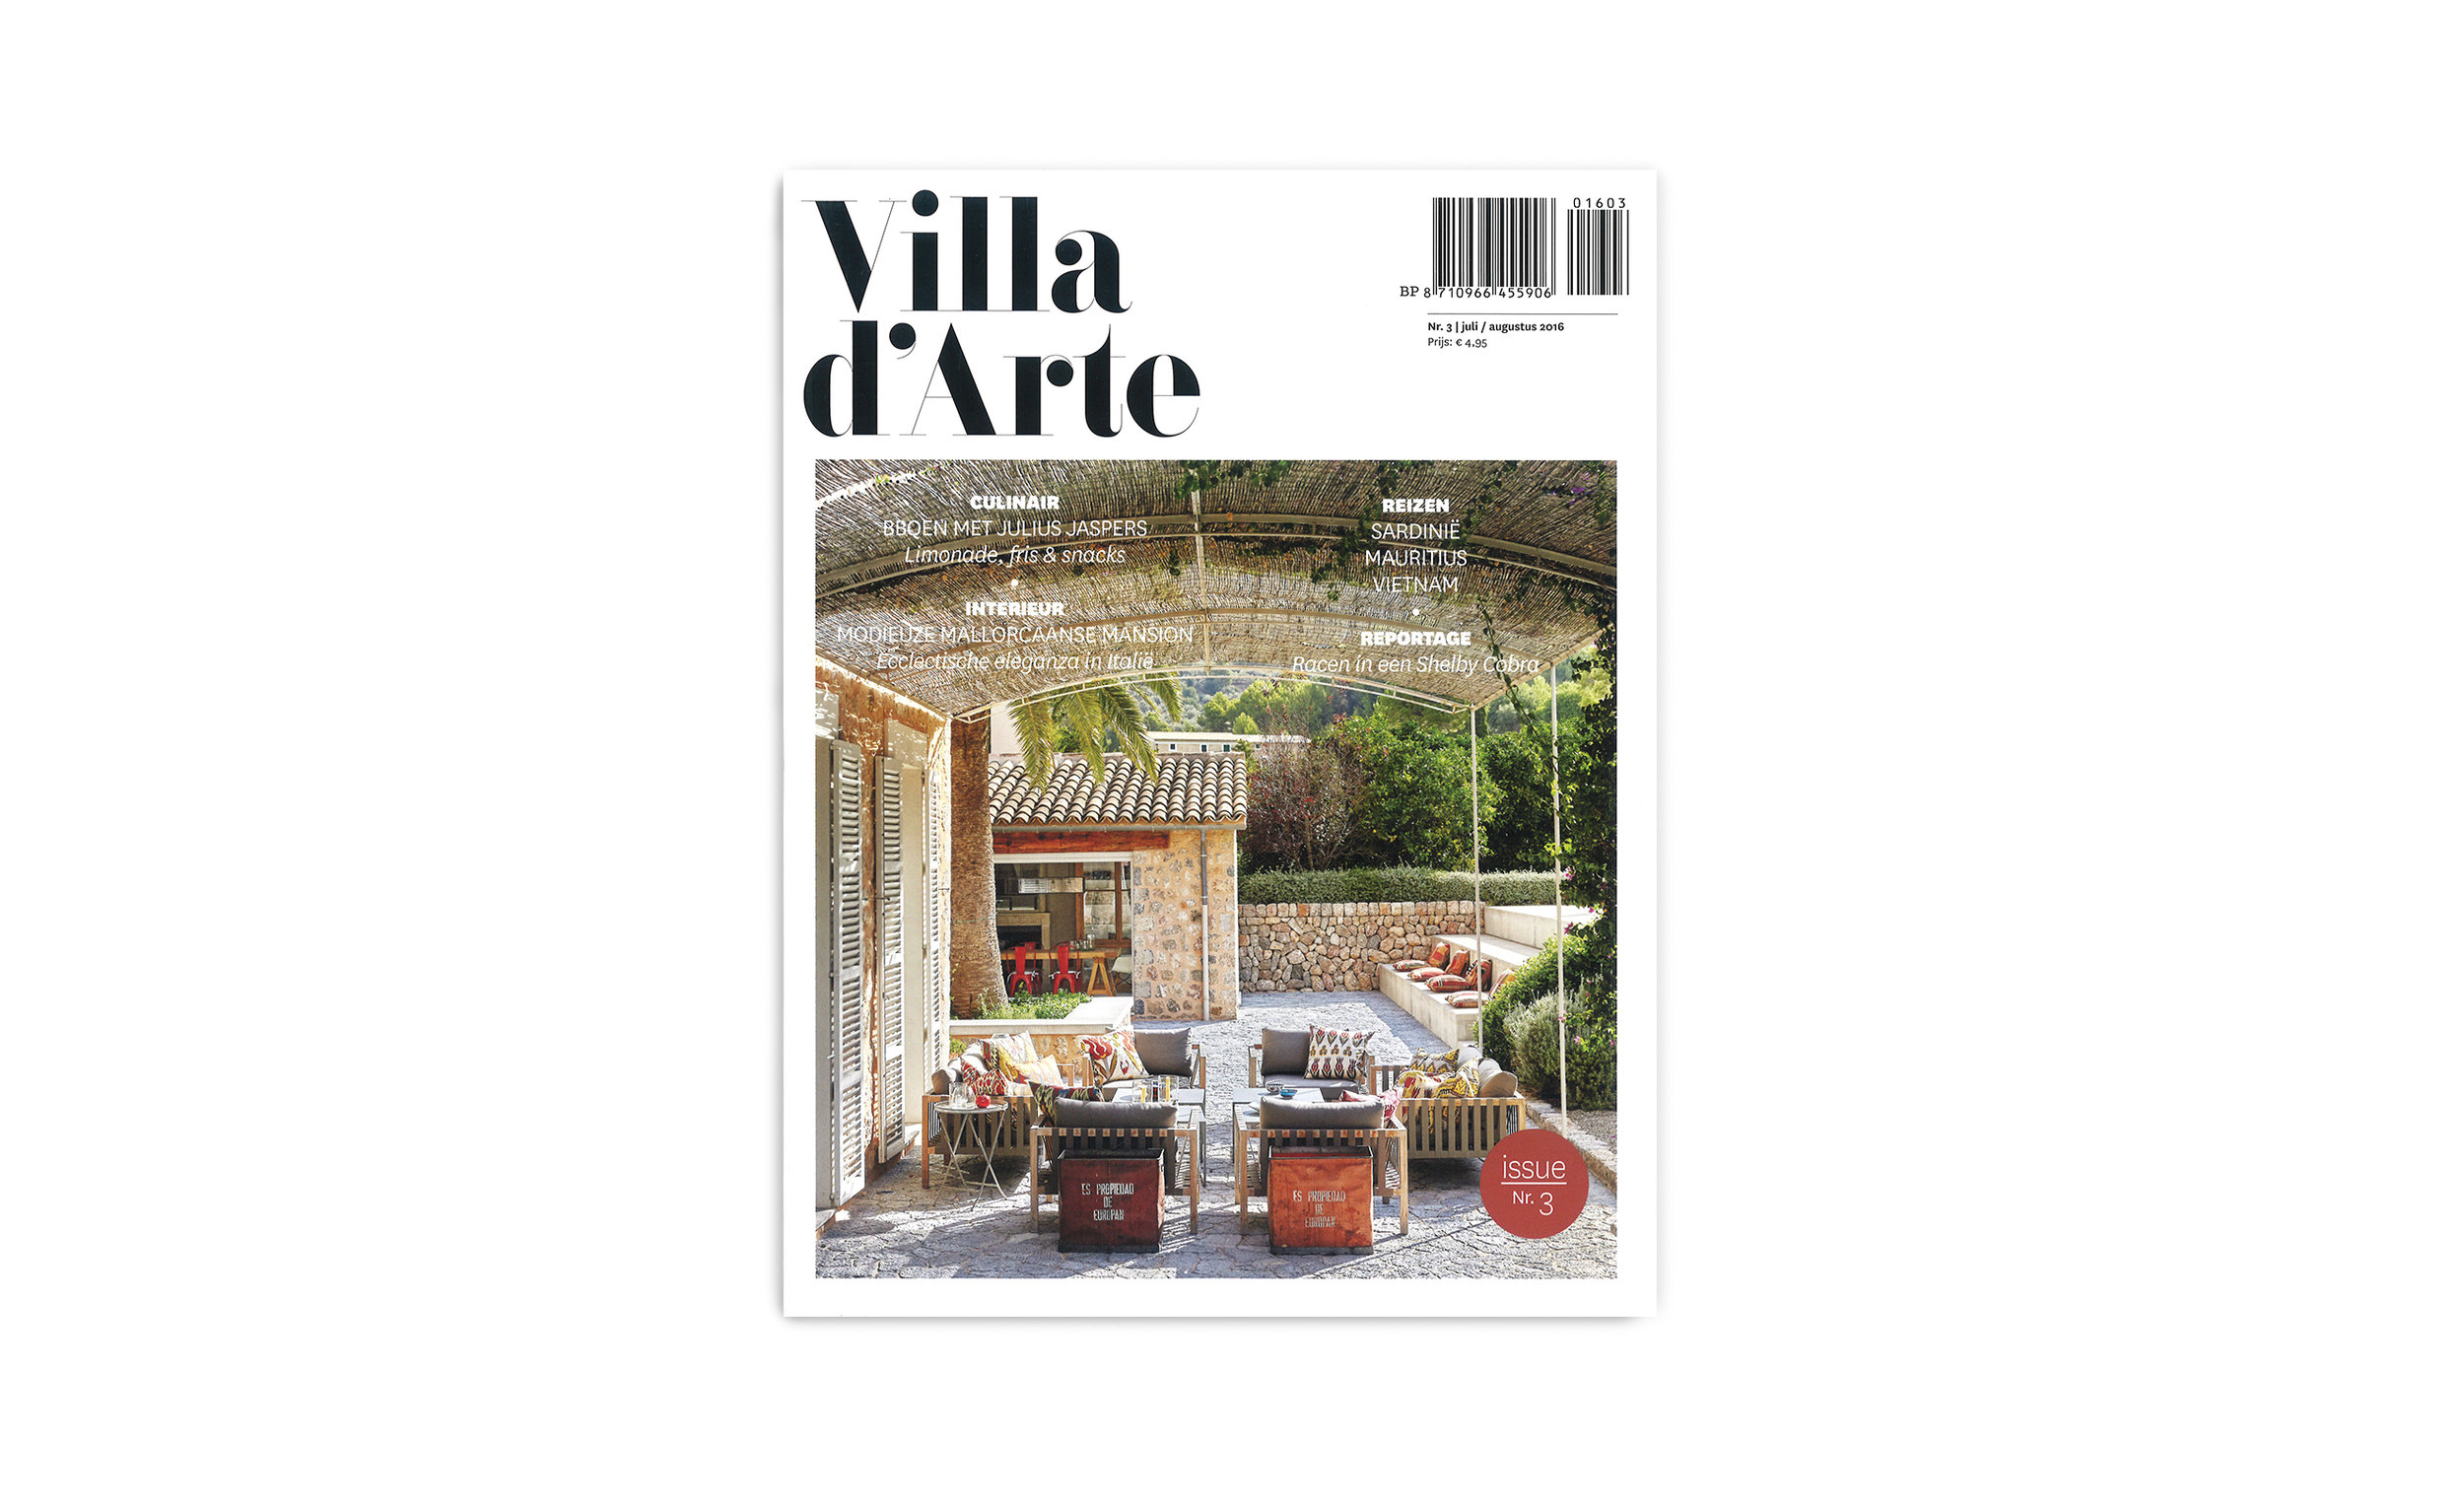 VILLA D'ARTE_COVER.jpg